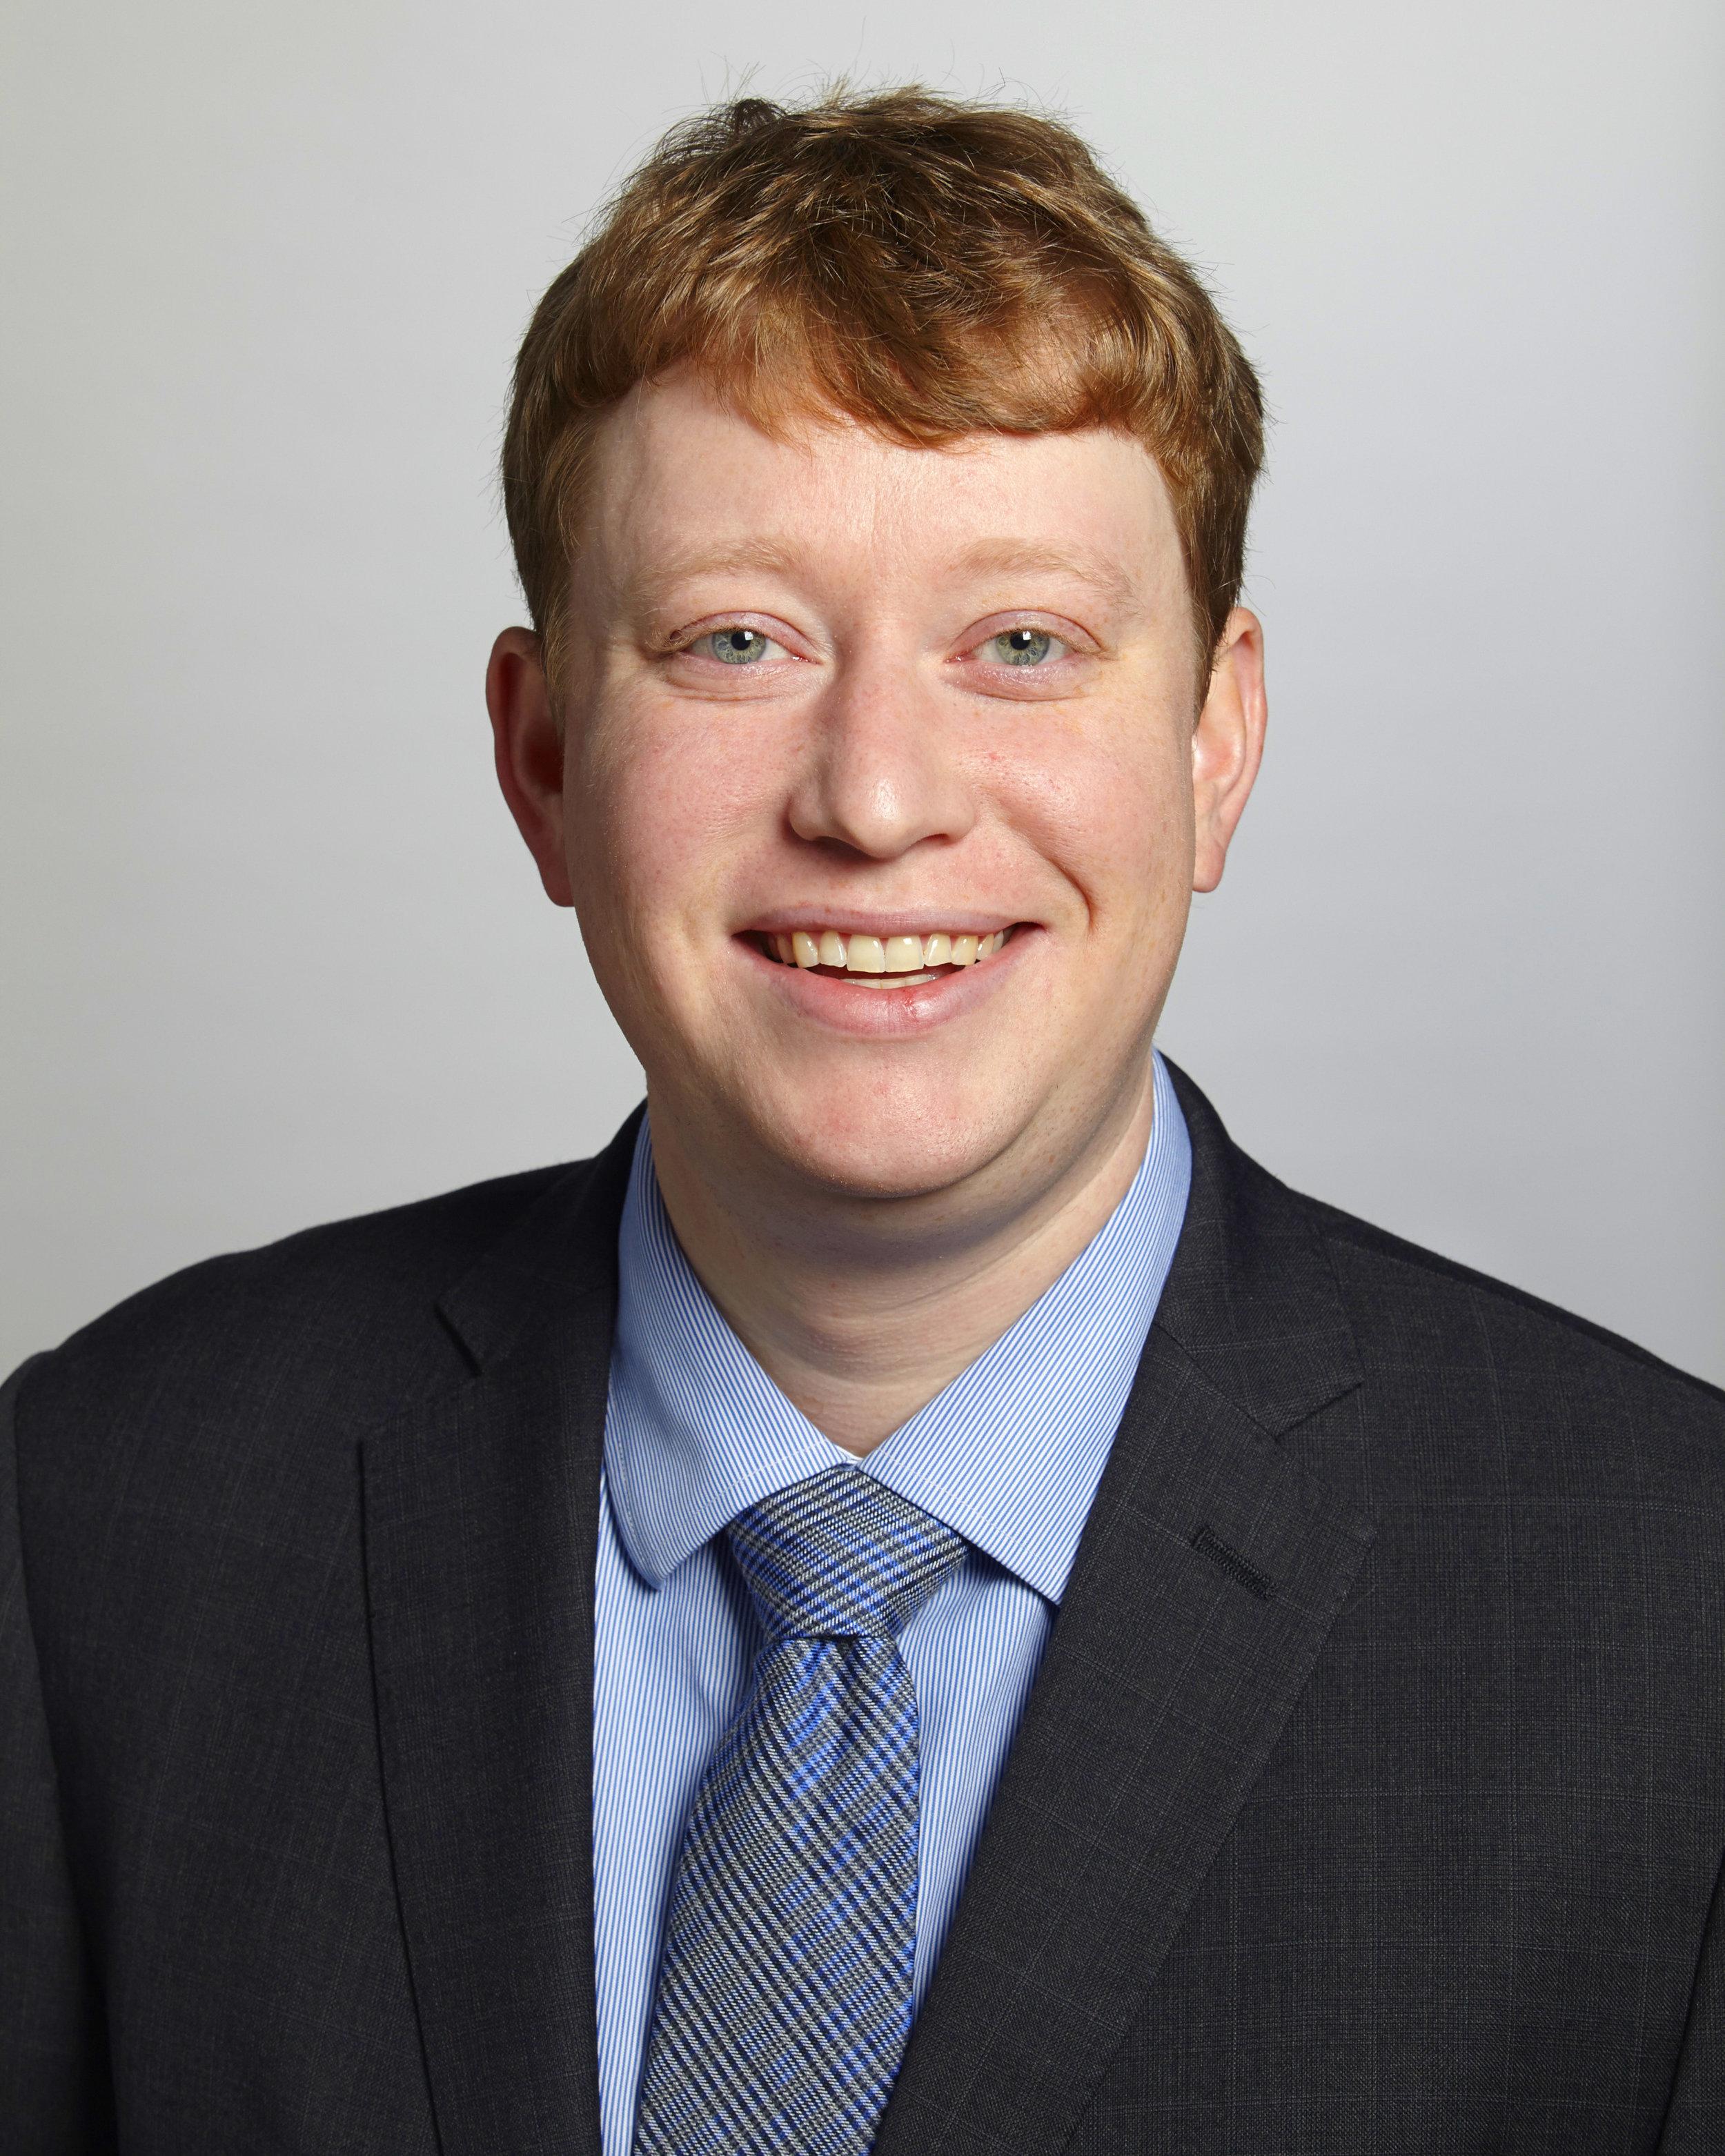 Anthony B. Costa, PhD - Assistant Professor, Neurological SurgeryDirector,Sinai Biodesign